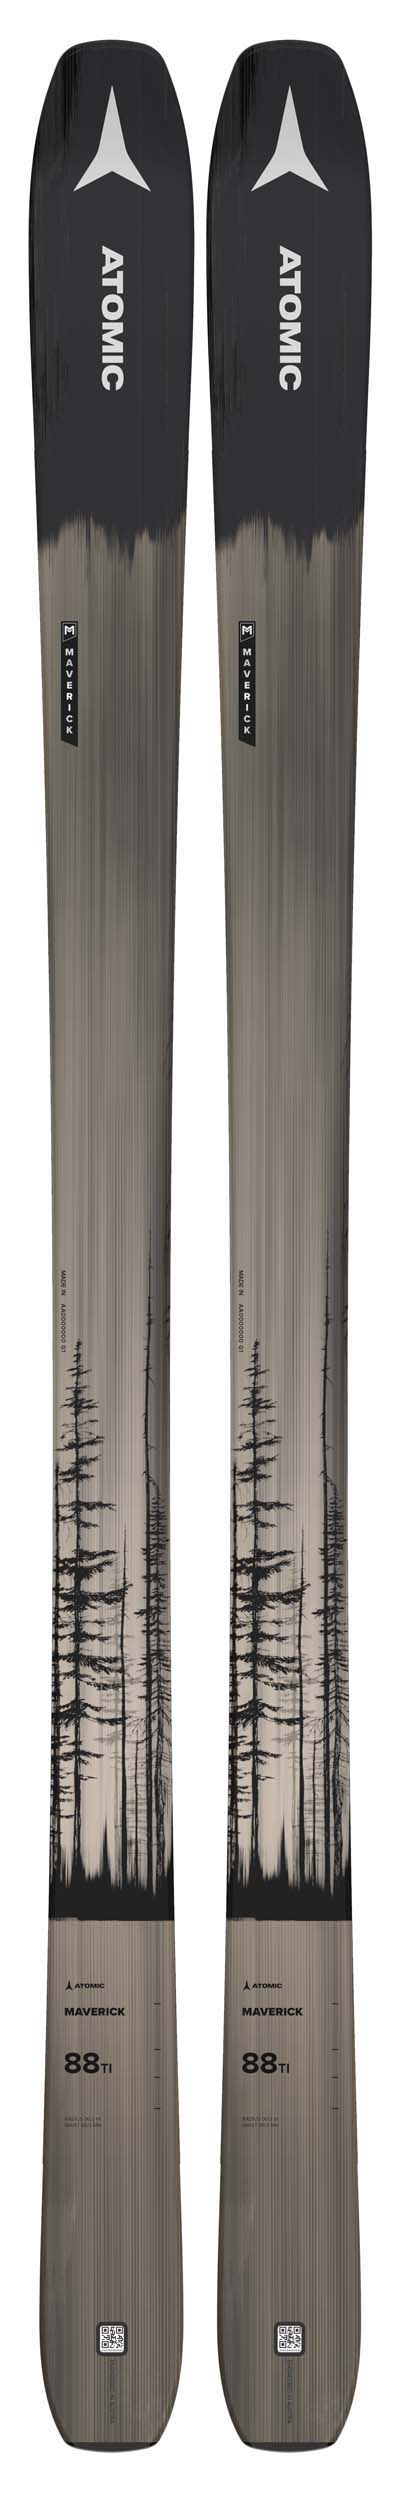 Atomic 2022 Maverick 88 TI Skis (Without Bindings / Flat) NEW !! 169cm